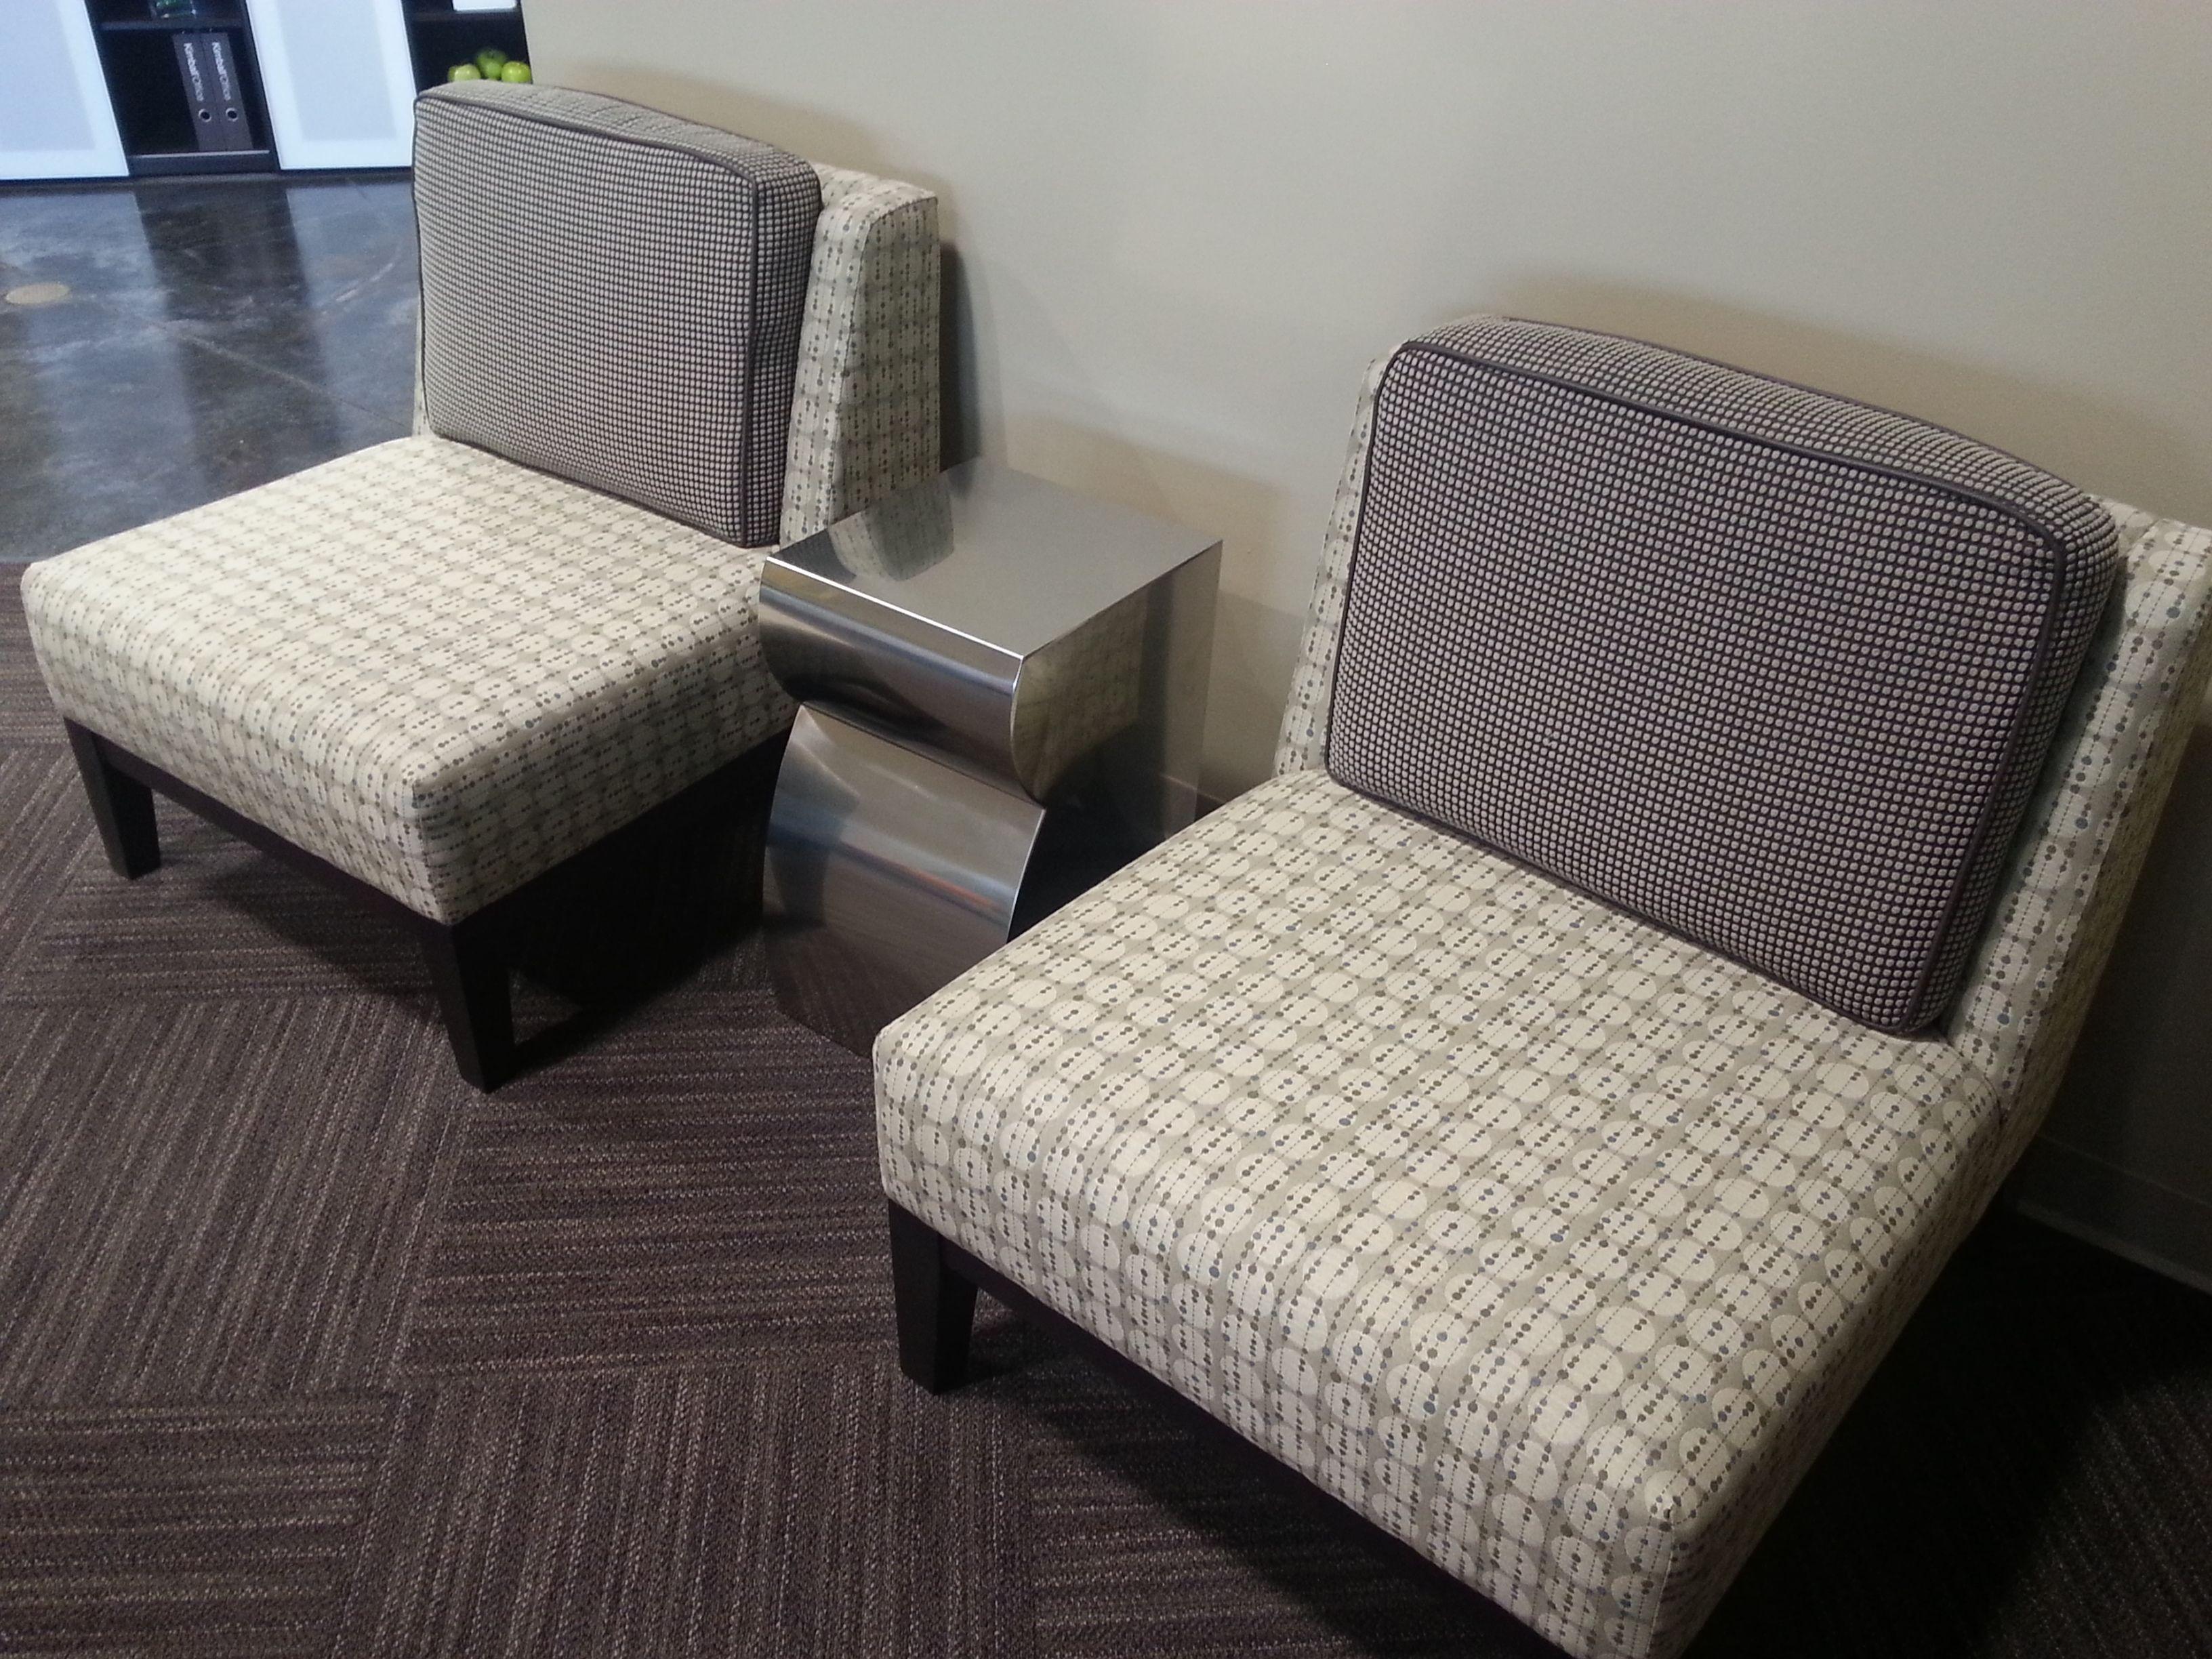 Kimball Pose Armless Furniture Home Decor Office Furniture